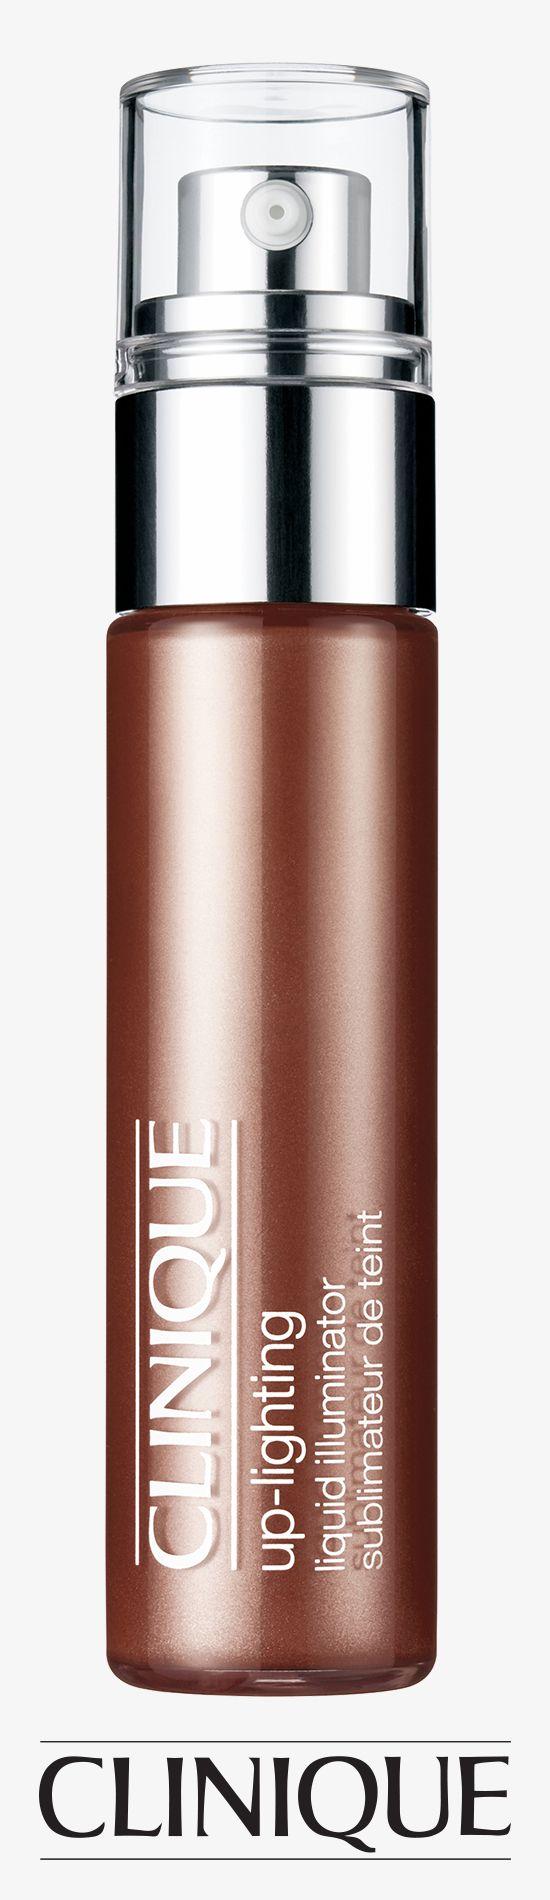 Sheer, lightweight liquid instantly illuminates skin. #Clinique Up-Lighting Liquid Illuminator.